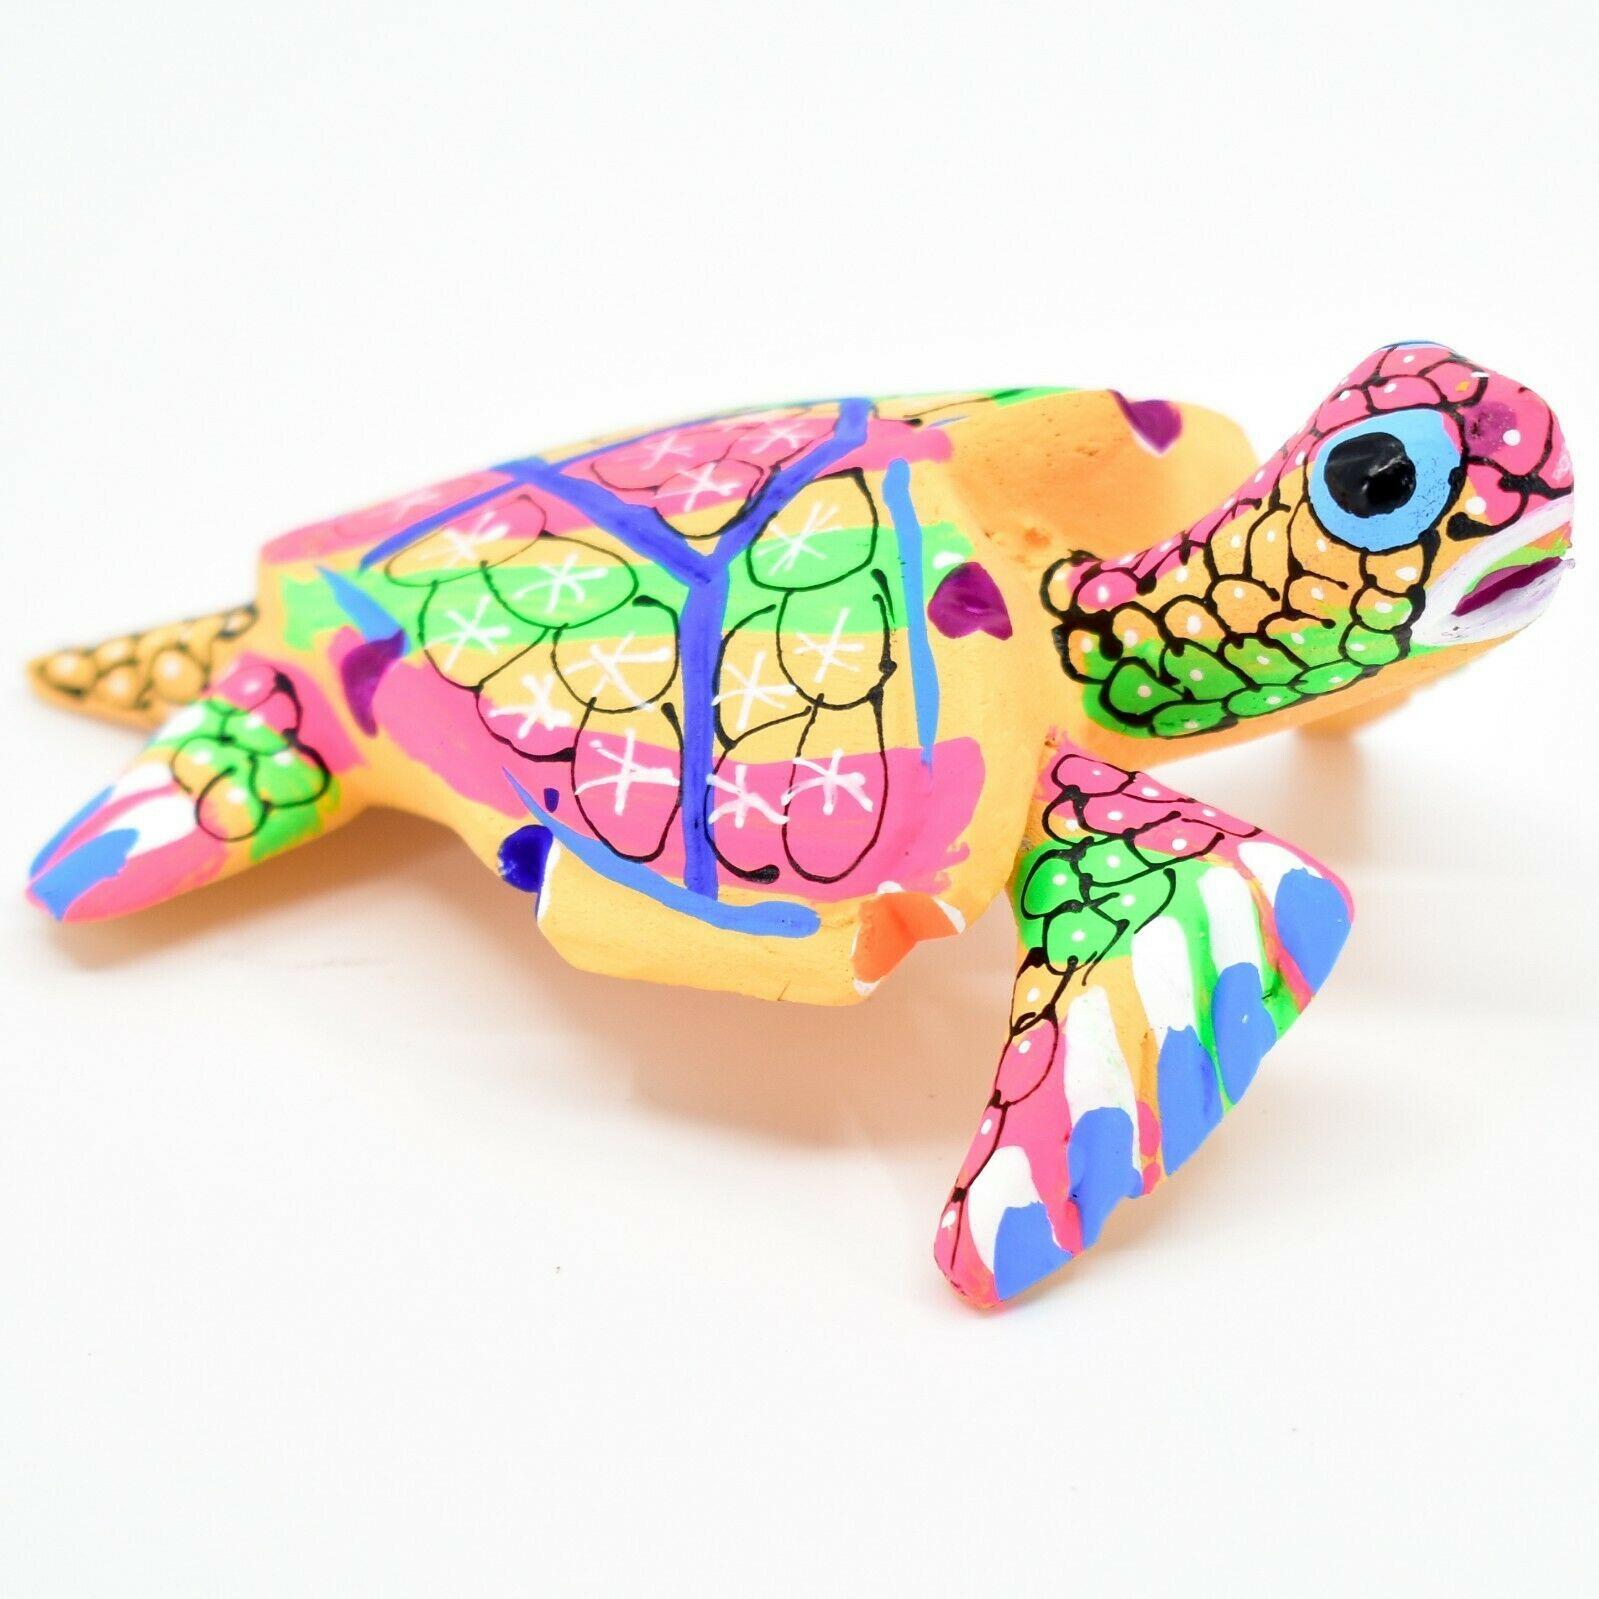 Handmade Oaxacan Copal Wood Carving Painted Sea Turtle Marine Figurine